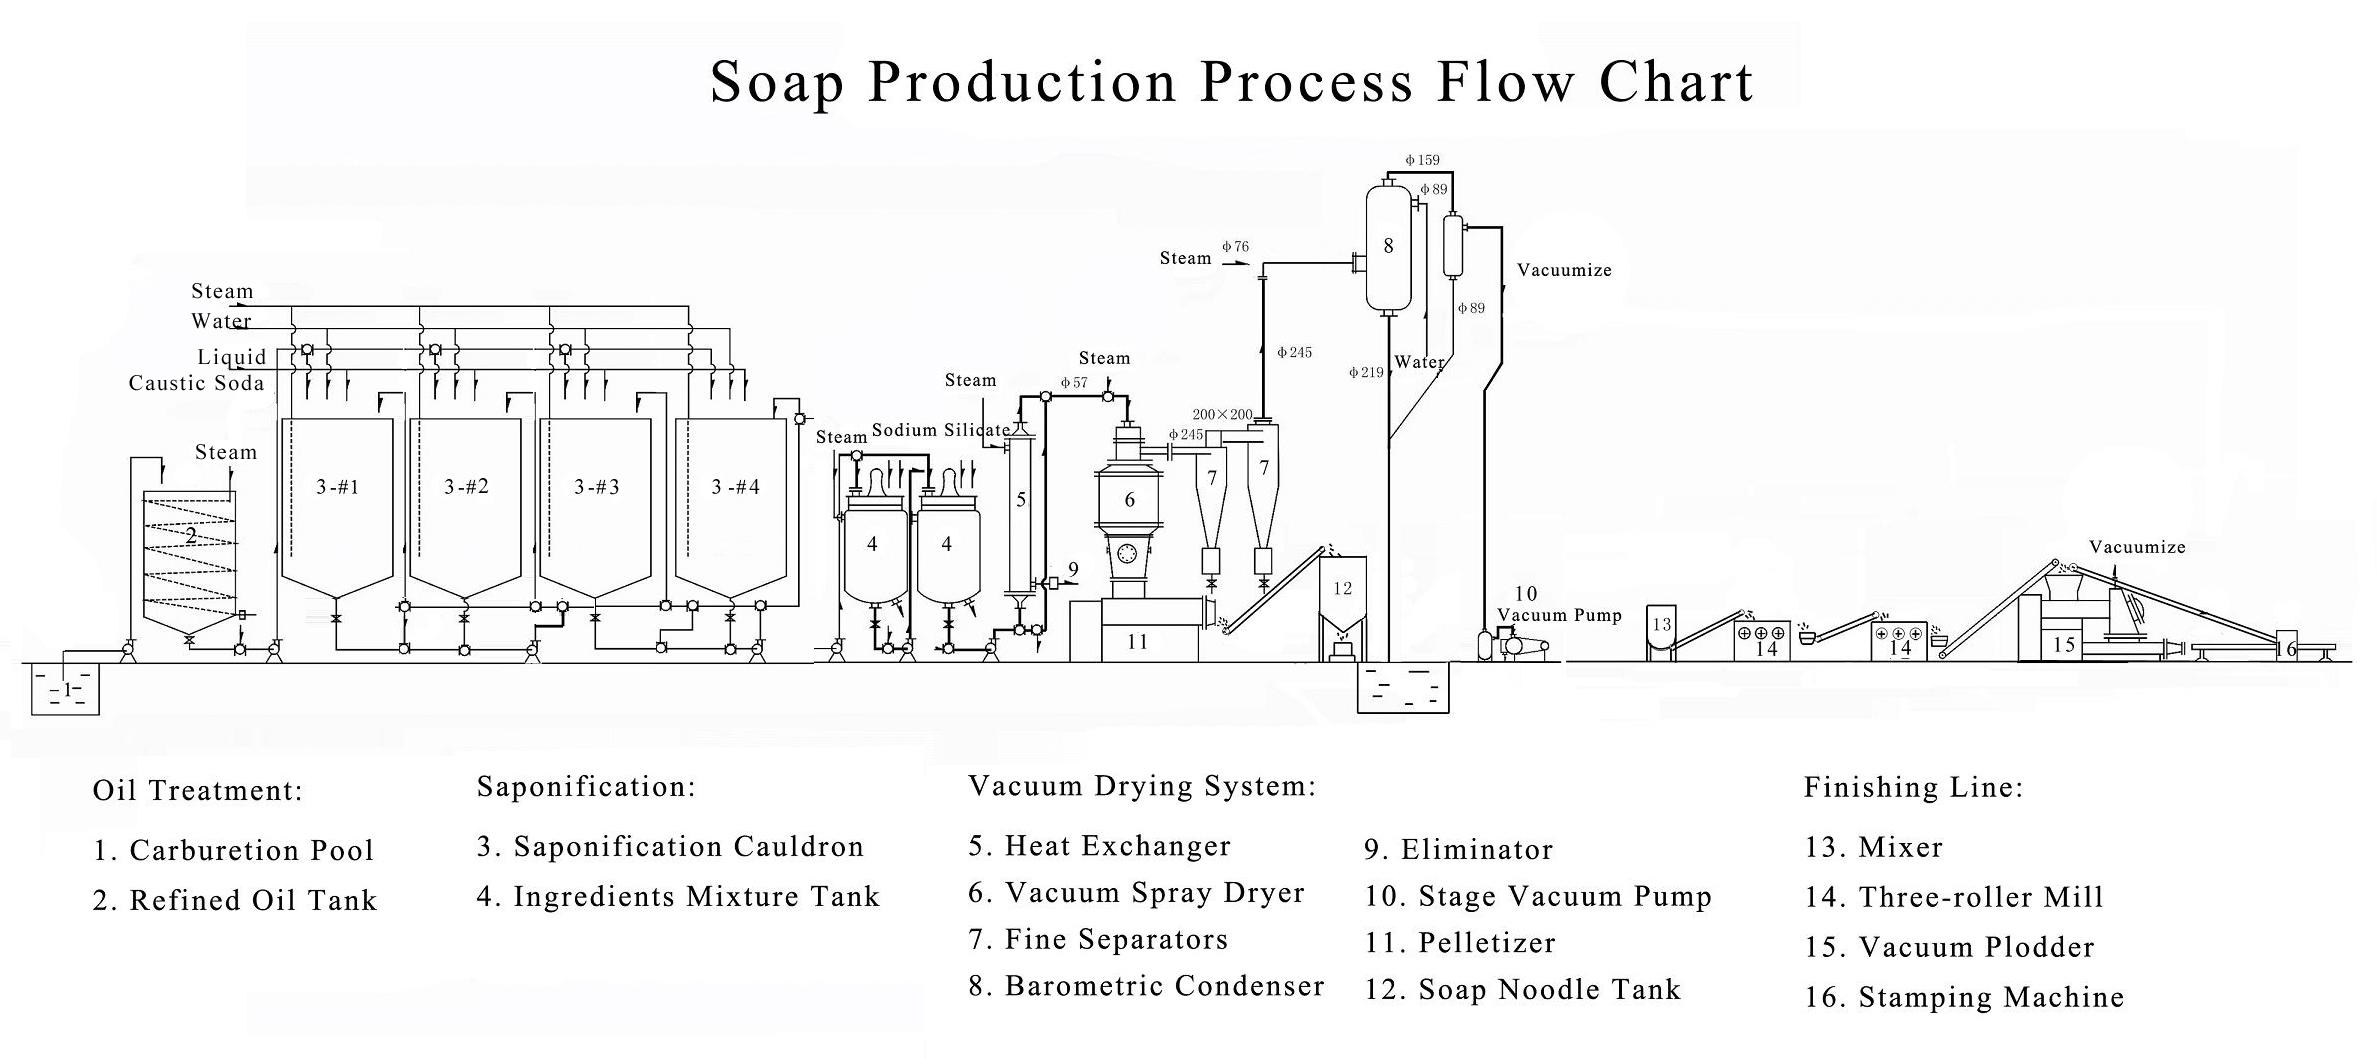 Soap Production Line Flowchart Layout drawing